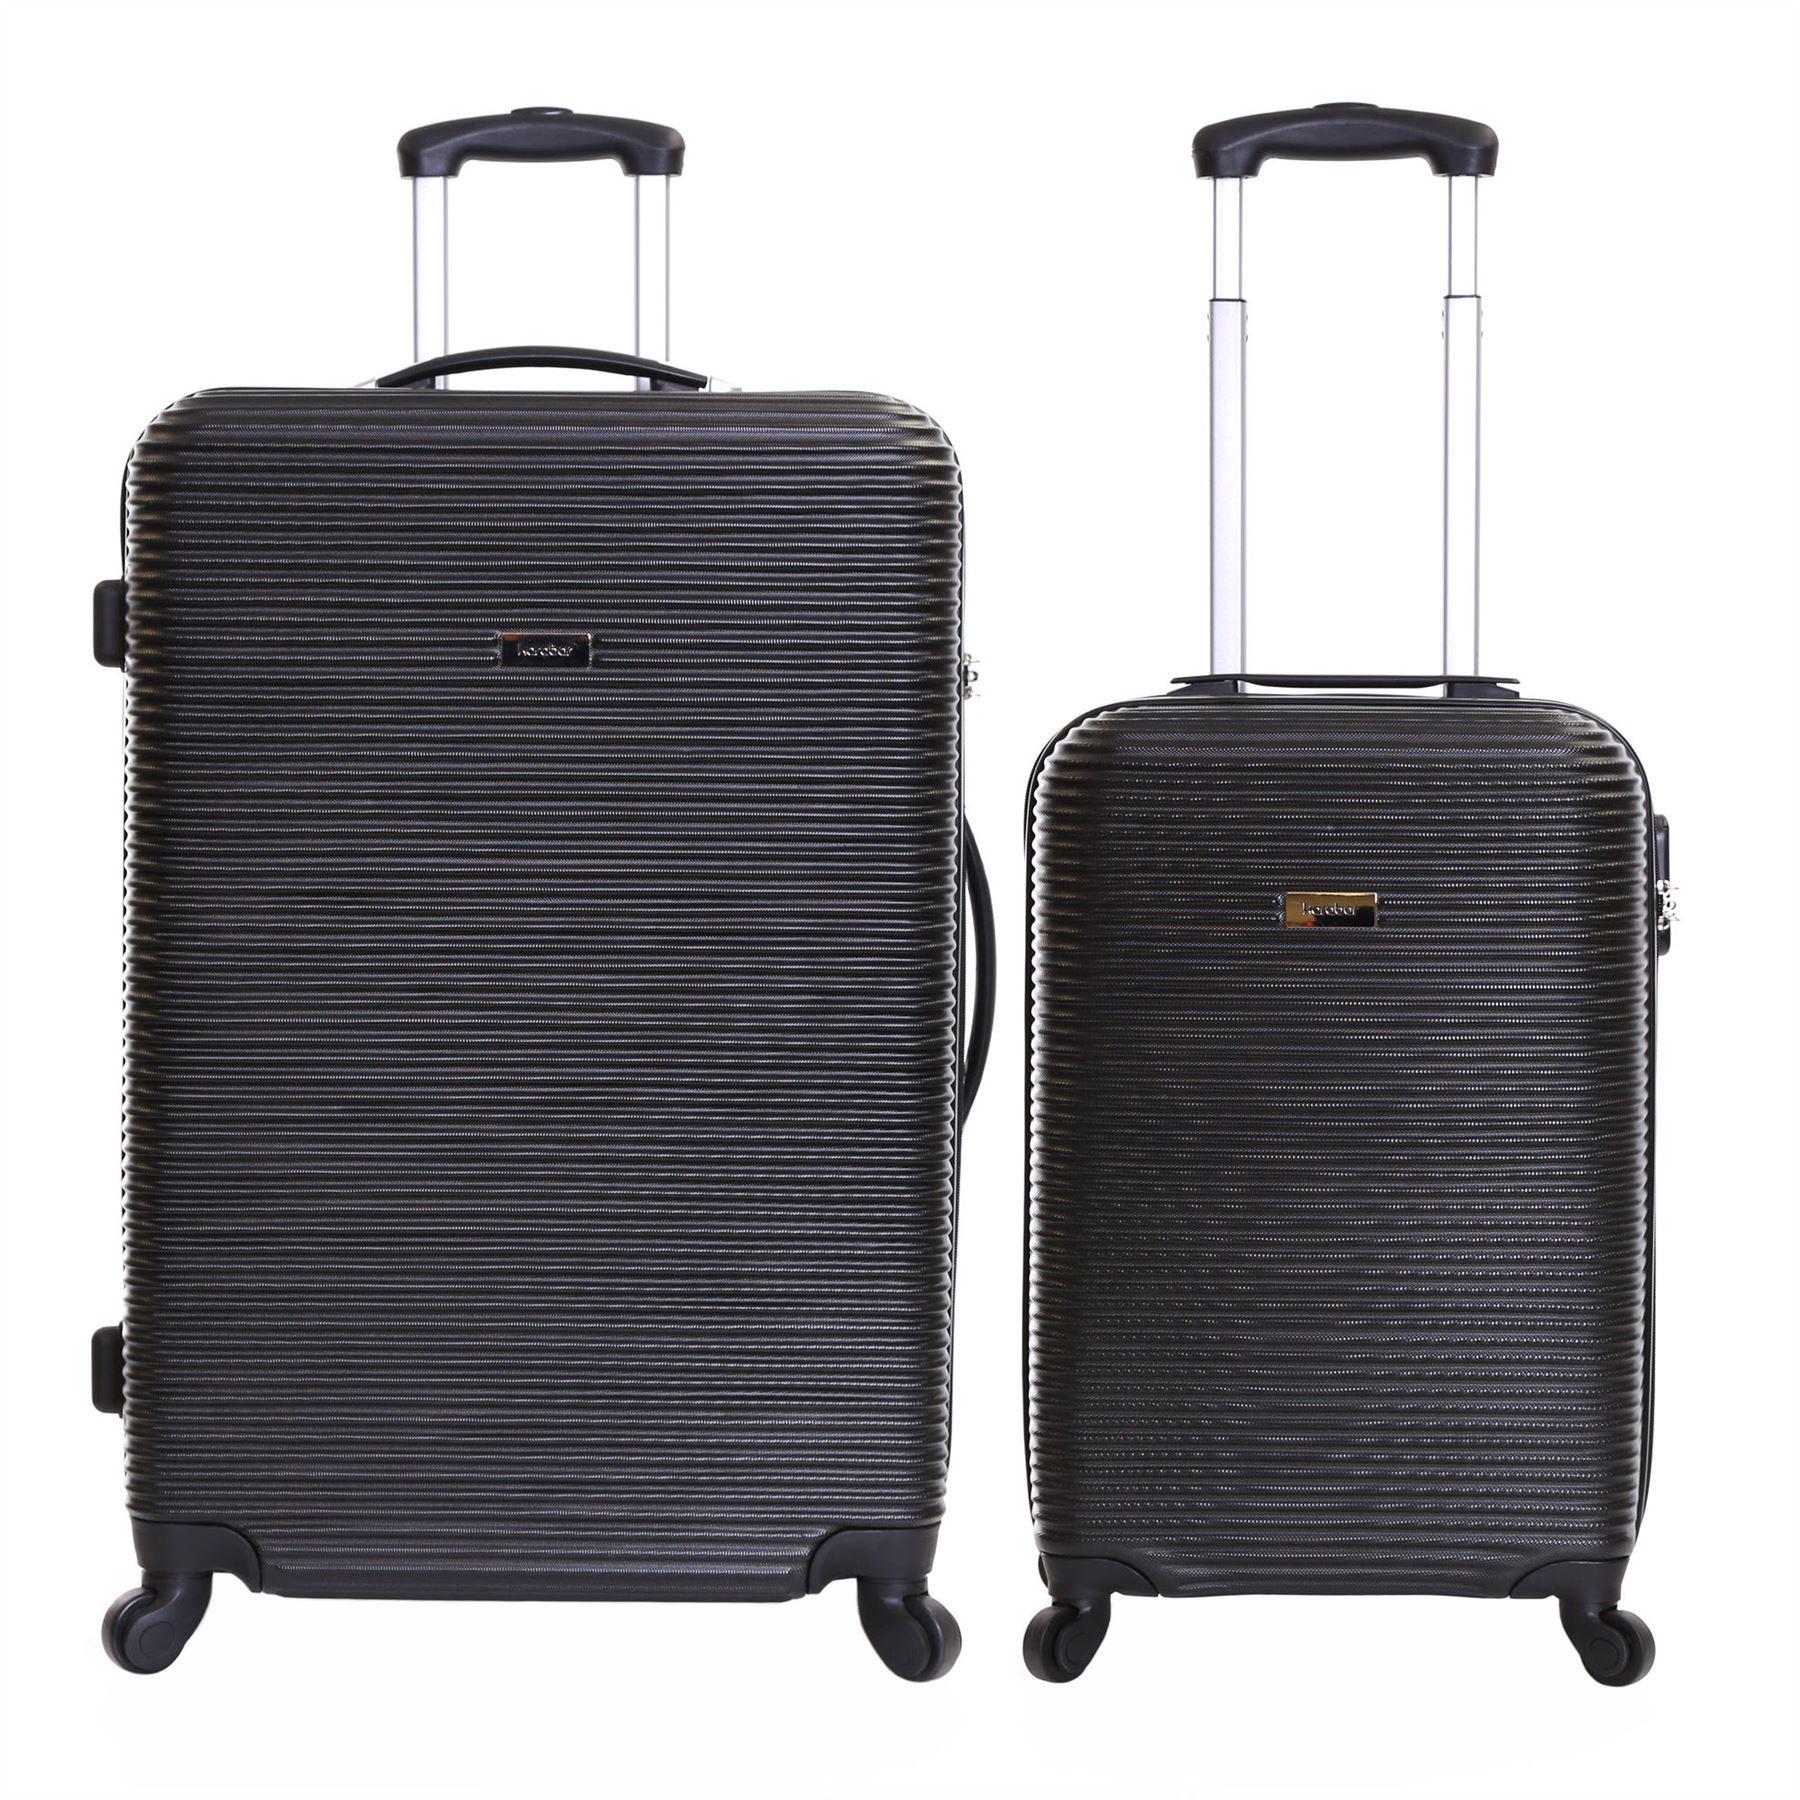 Karabar Set of 2 Hard Plastic 4 Wheeled Luggage Trolleys Suitcases ...